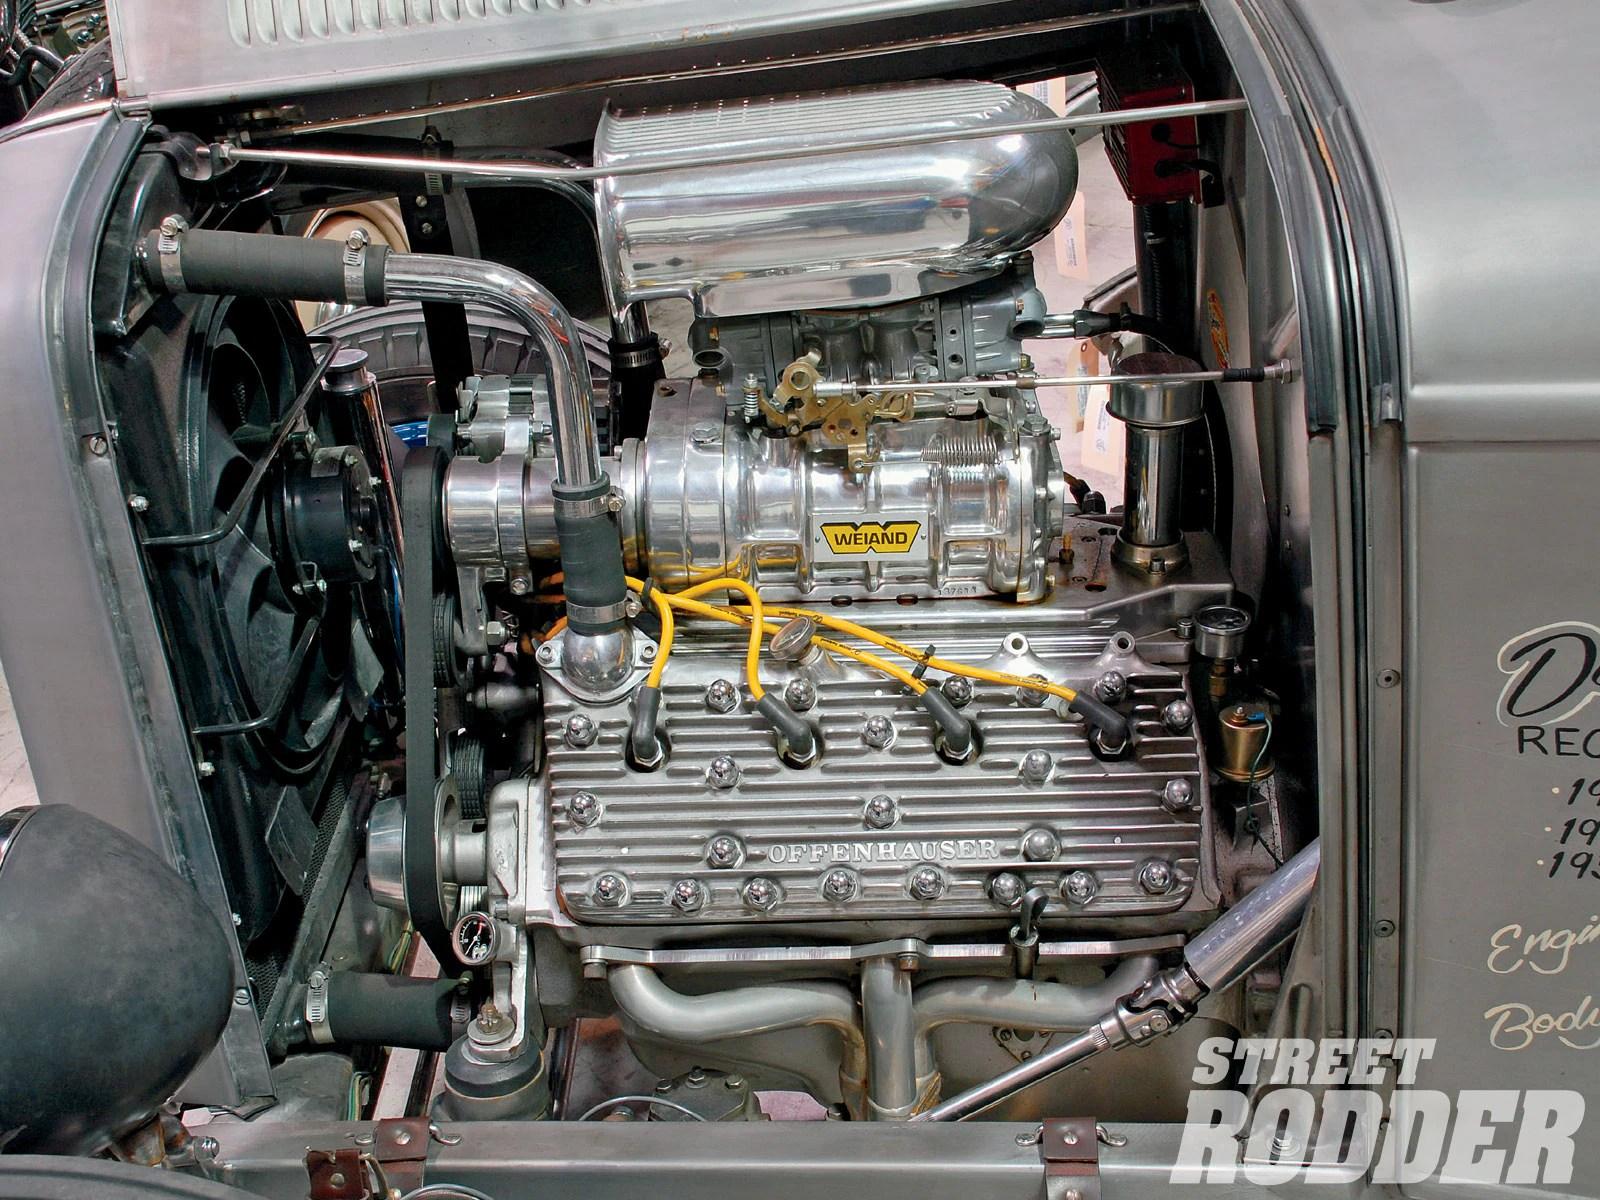 flathead ford engines internal diagrams wiring diagram database flathead ford engines internal diagrams [ 1600 x 1200 Pixel ]